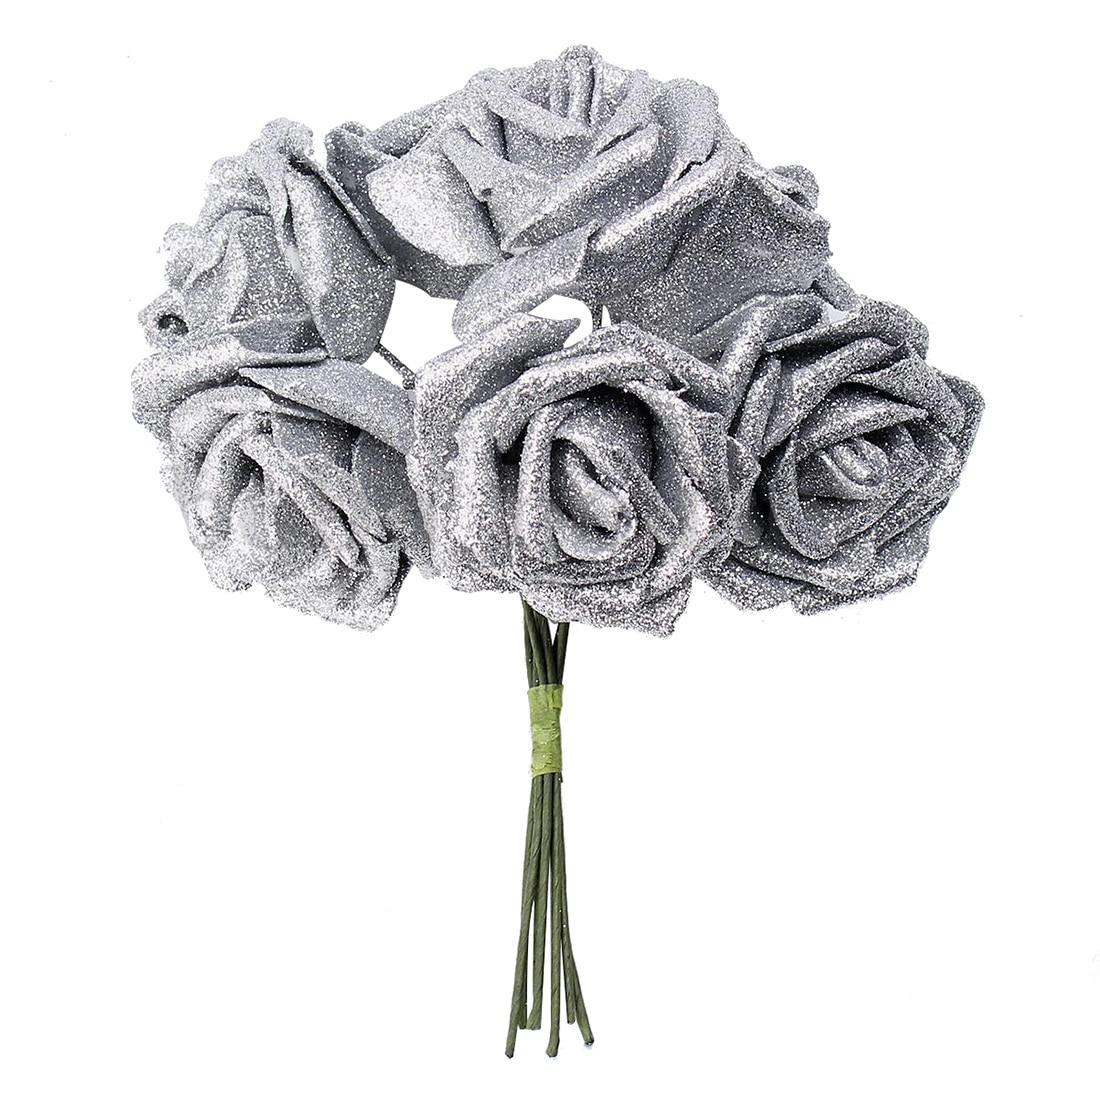 7 Foam Rose Artificial Flower Glitter Bridal Bouquet Home Wedding Decoration Silver